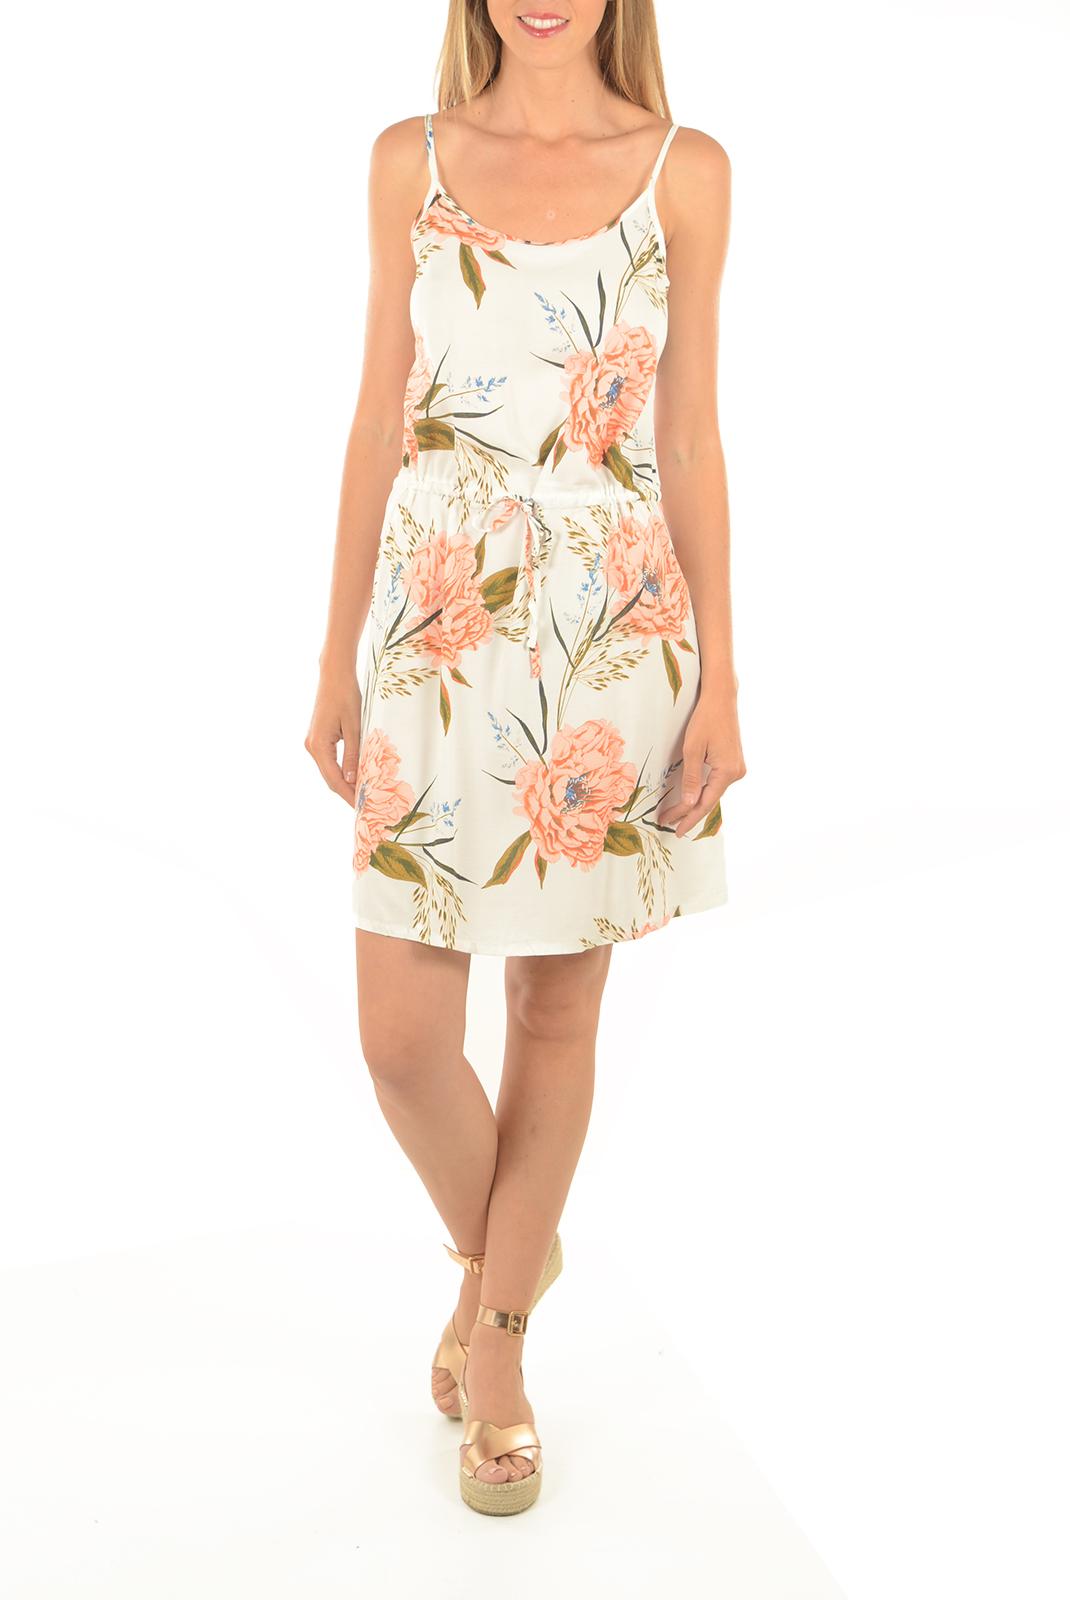 Robes  Vero moda NOW SINGLET SHORT DRESS BUTTERCREAM/CAROLINE P